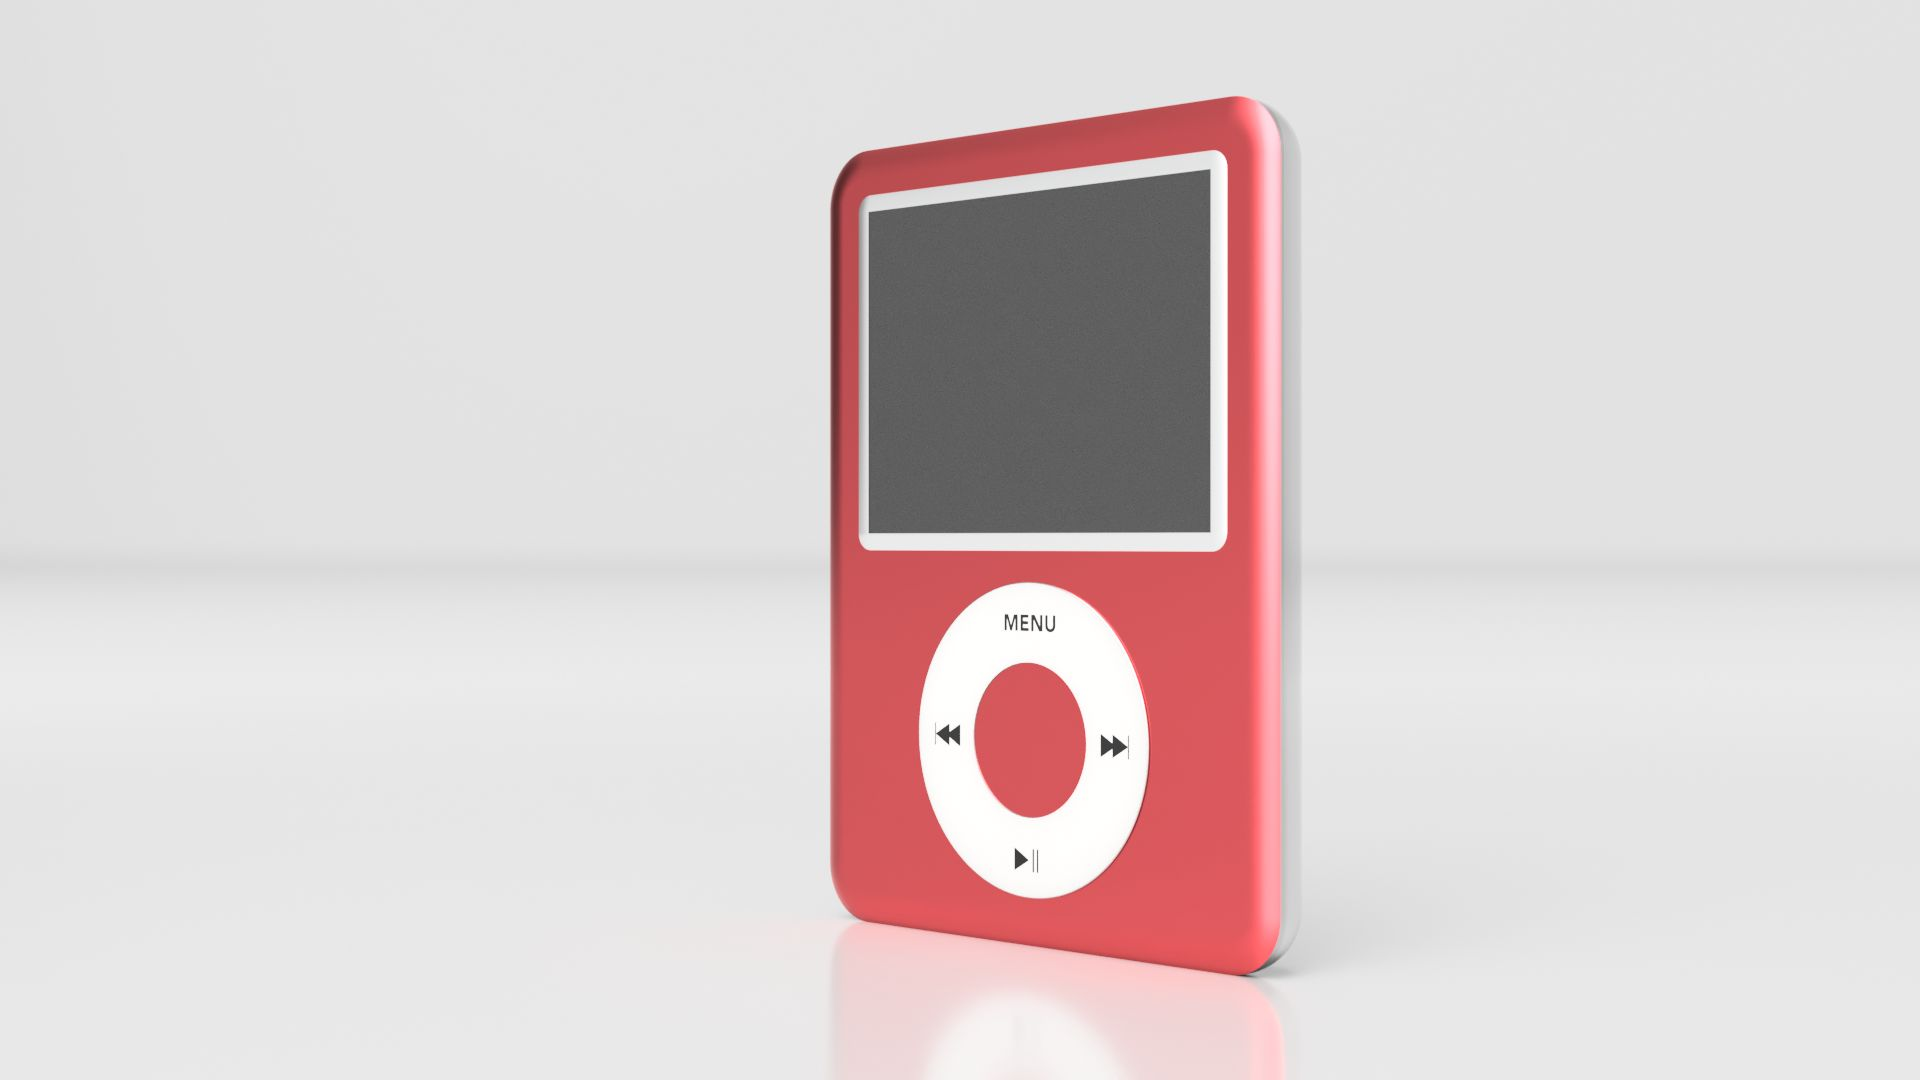 ipod nano 3rd generation - HD1920×1080